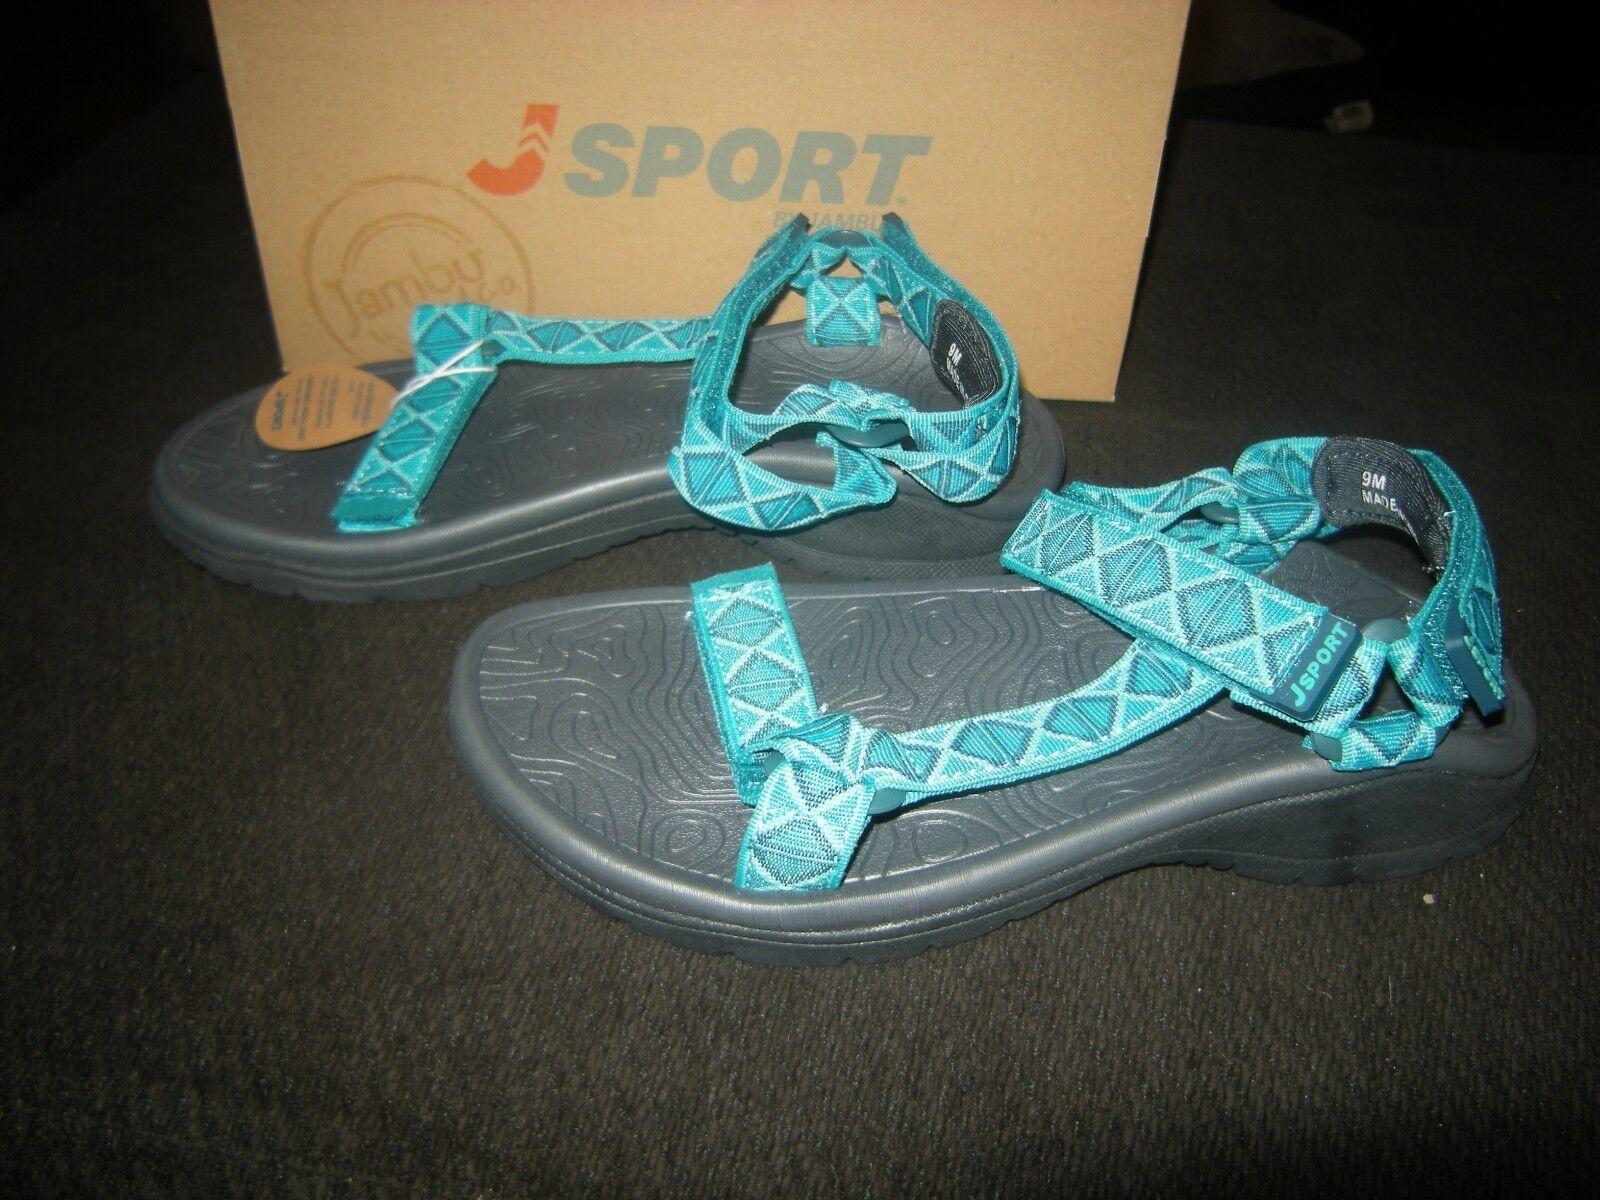 New Womens Turquoise Green J Sport by Jambu Navajo Water Ready Sandals, Size 10